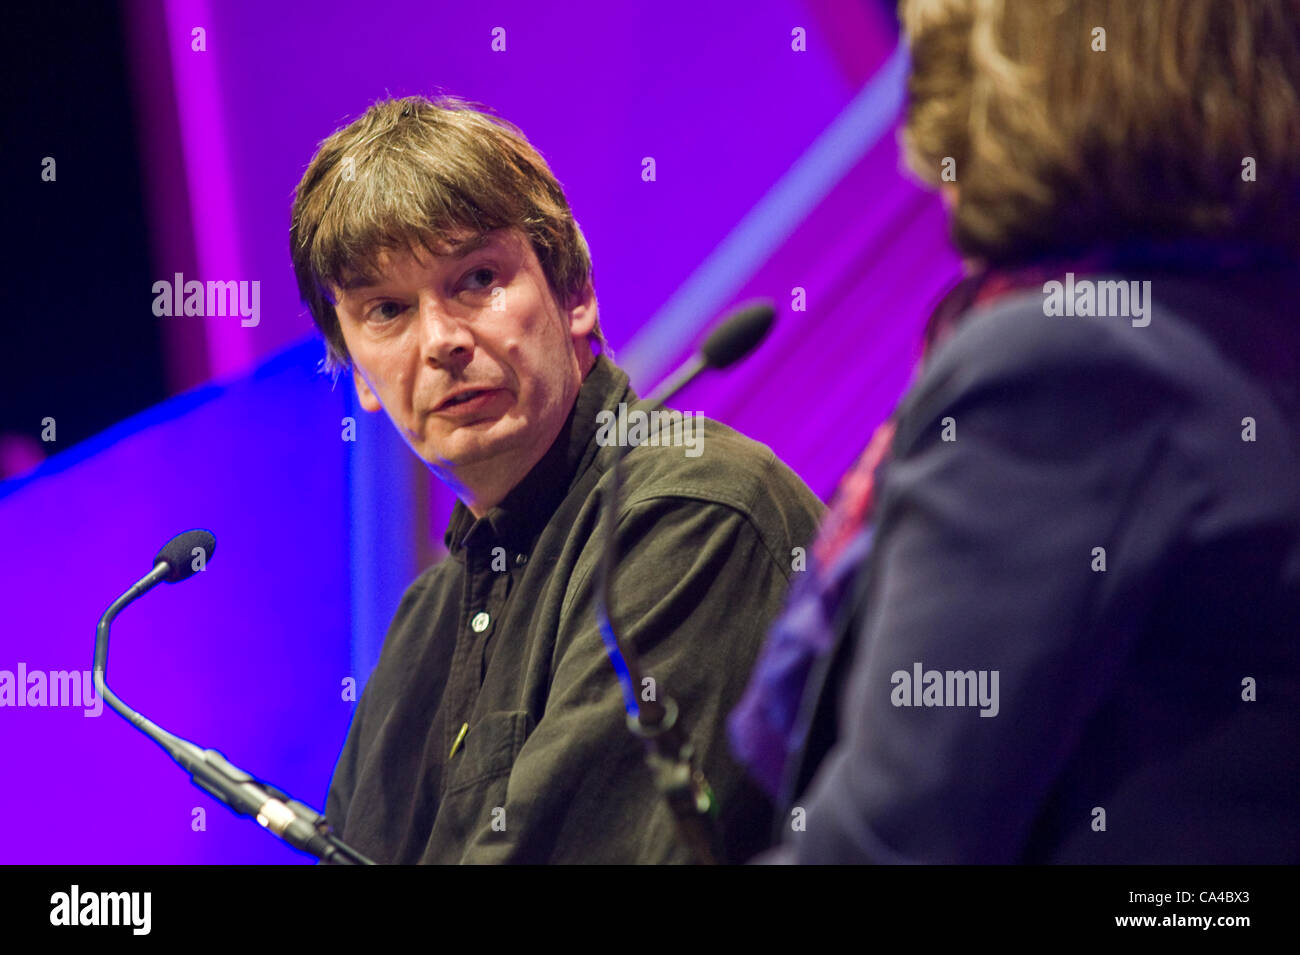 Ian Rankin, Scottish crime writer, speaking at The Telegraph Hay Festival 2012, Hay-on-Wye, Powys, Wales, UK - Stock Image